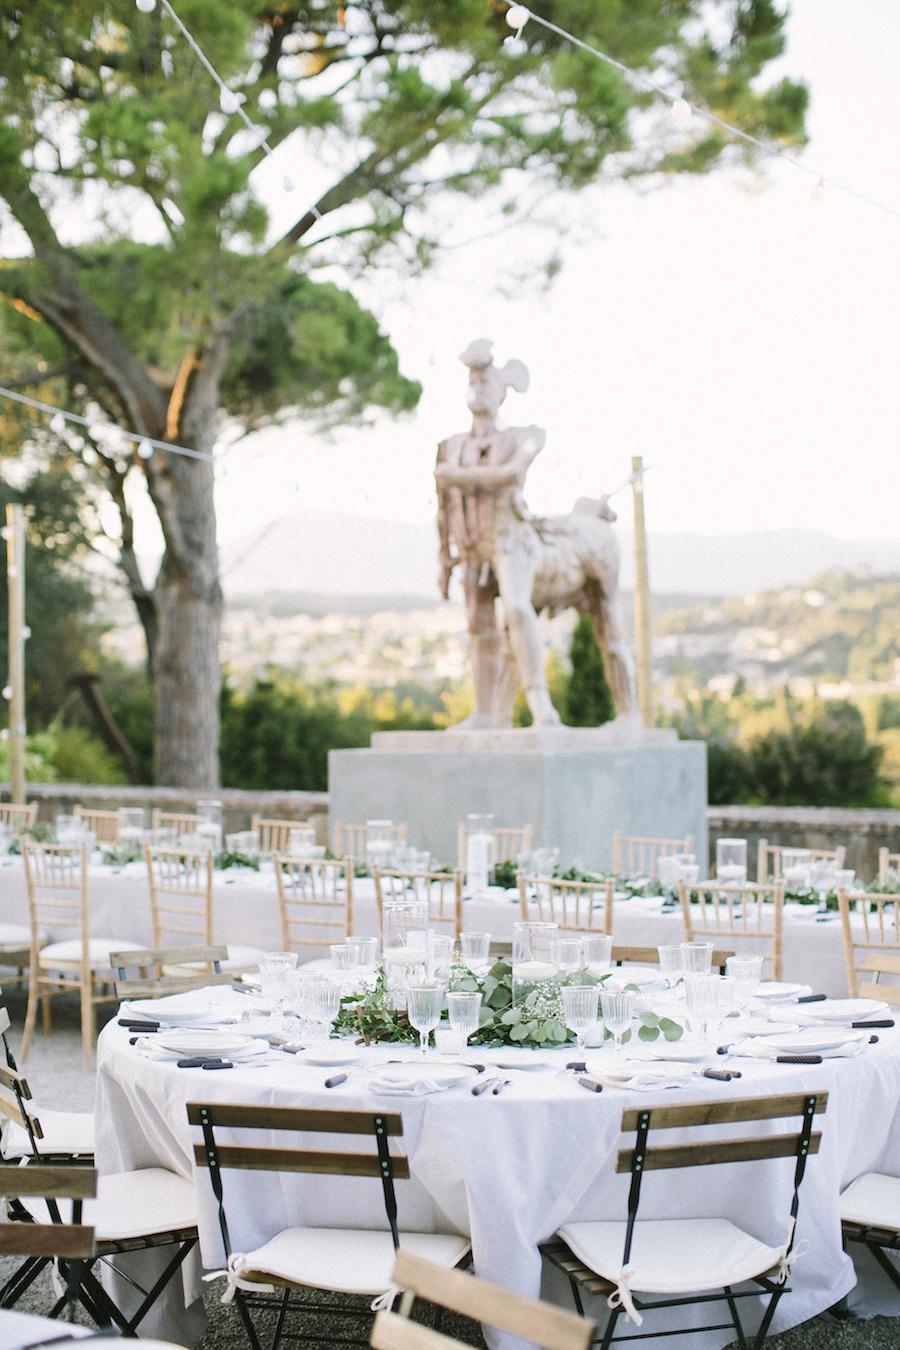 saya-photography-wedding-french-riviera-rustic-antibes-la-bastide-du-roy-95.jpg